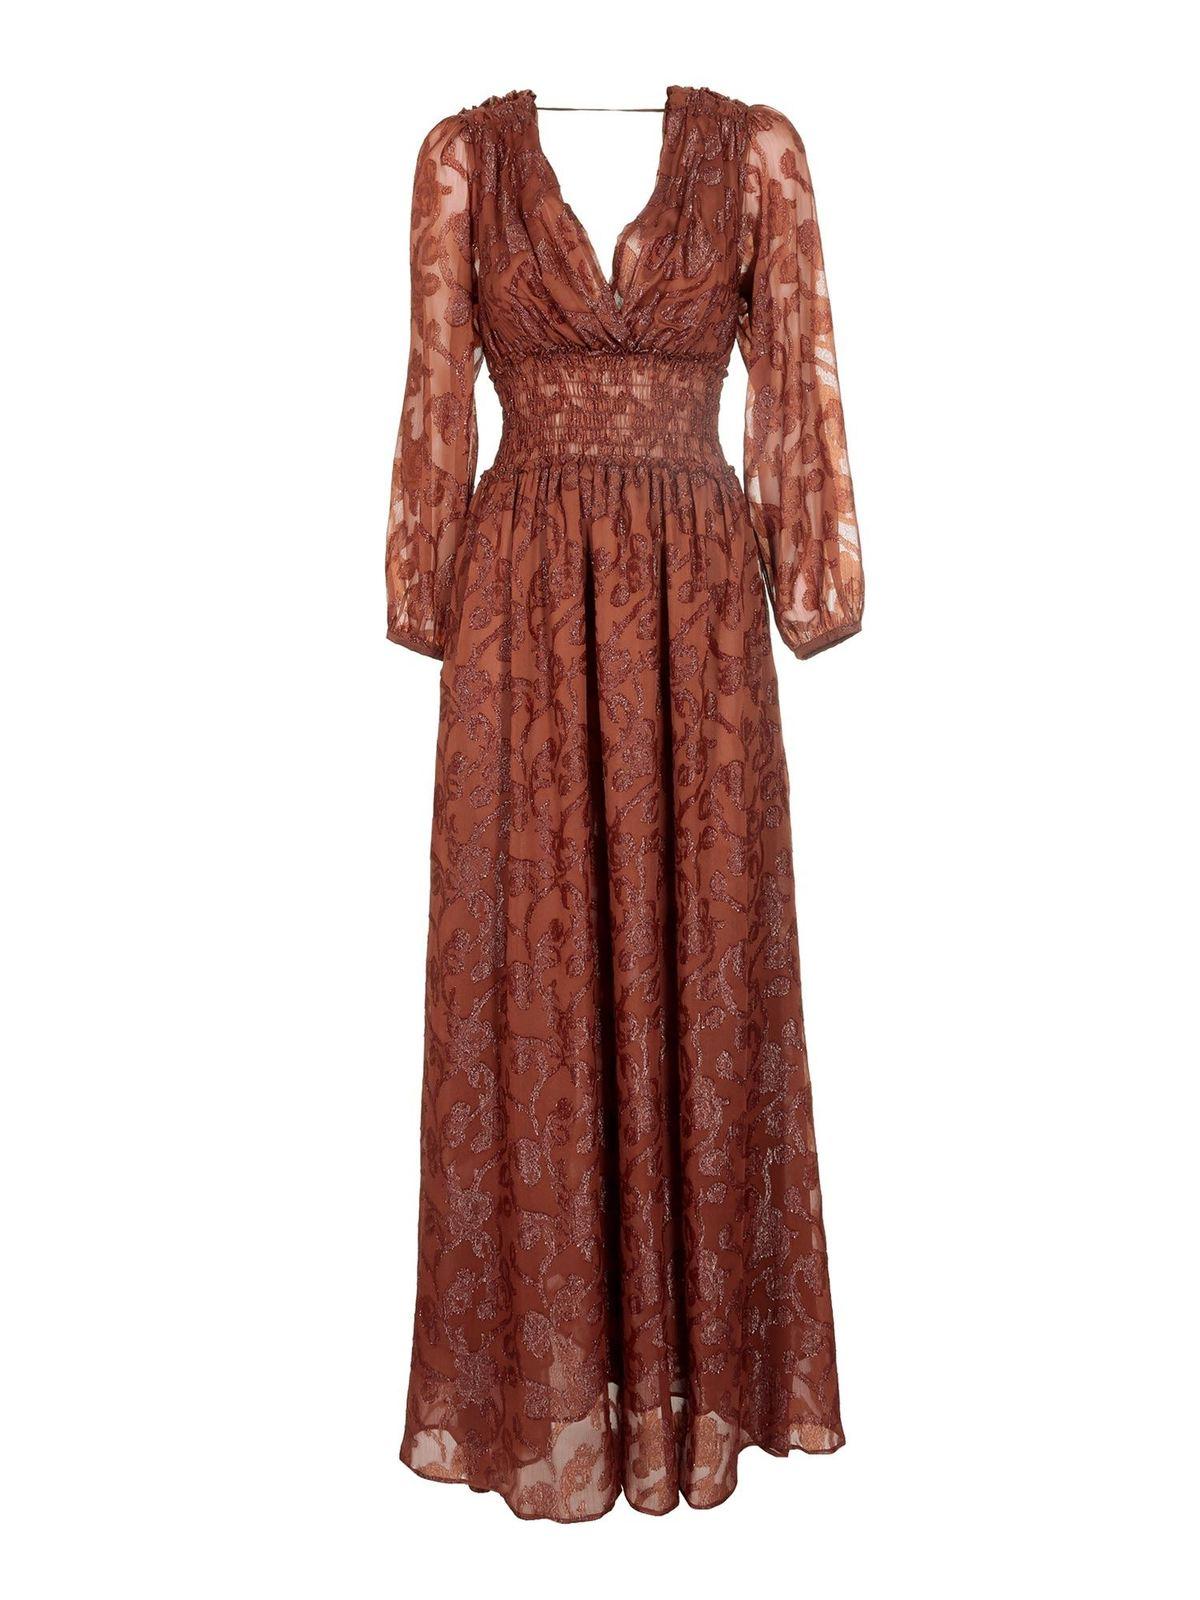 Pinko Linings LAME DETAILED LONG DRESS IN BROWN